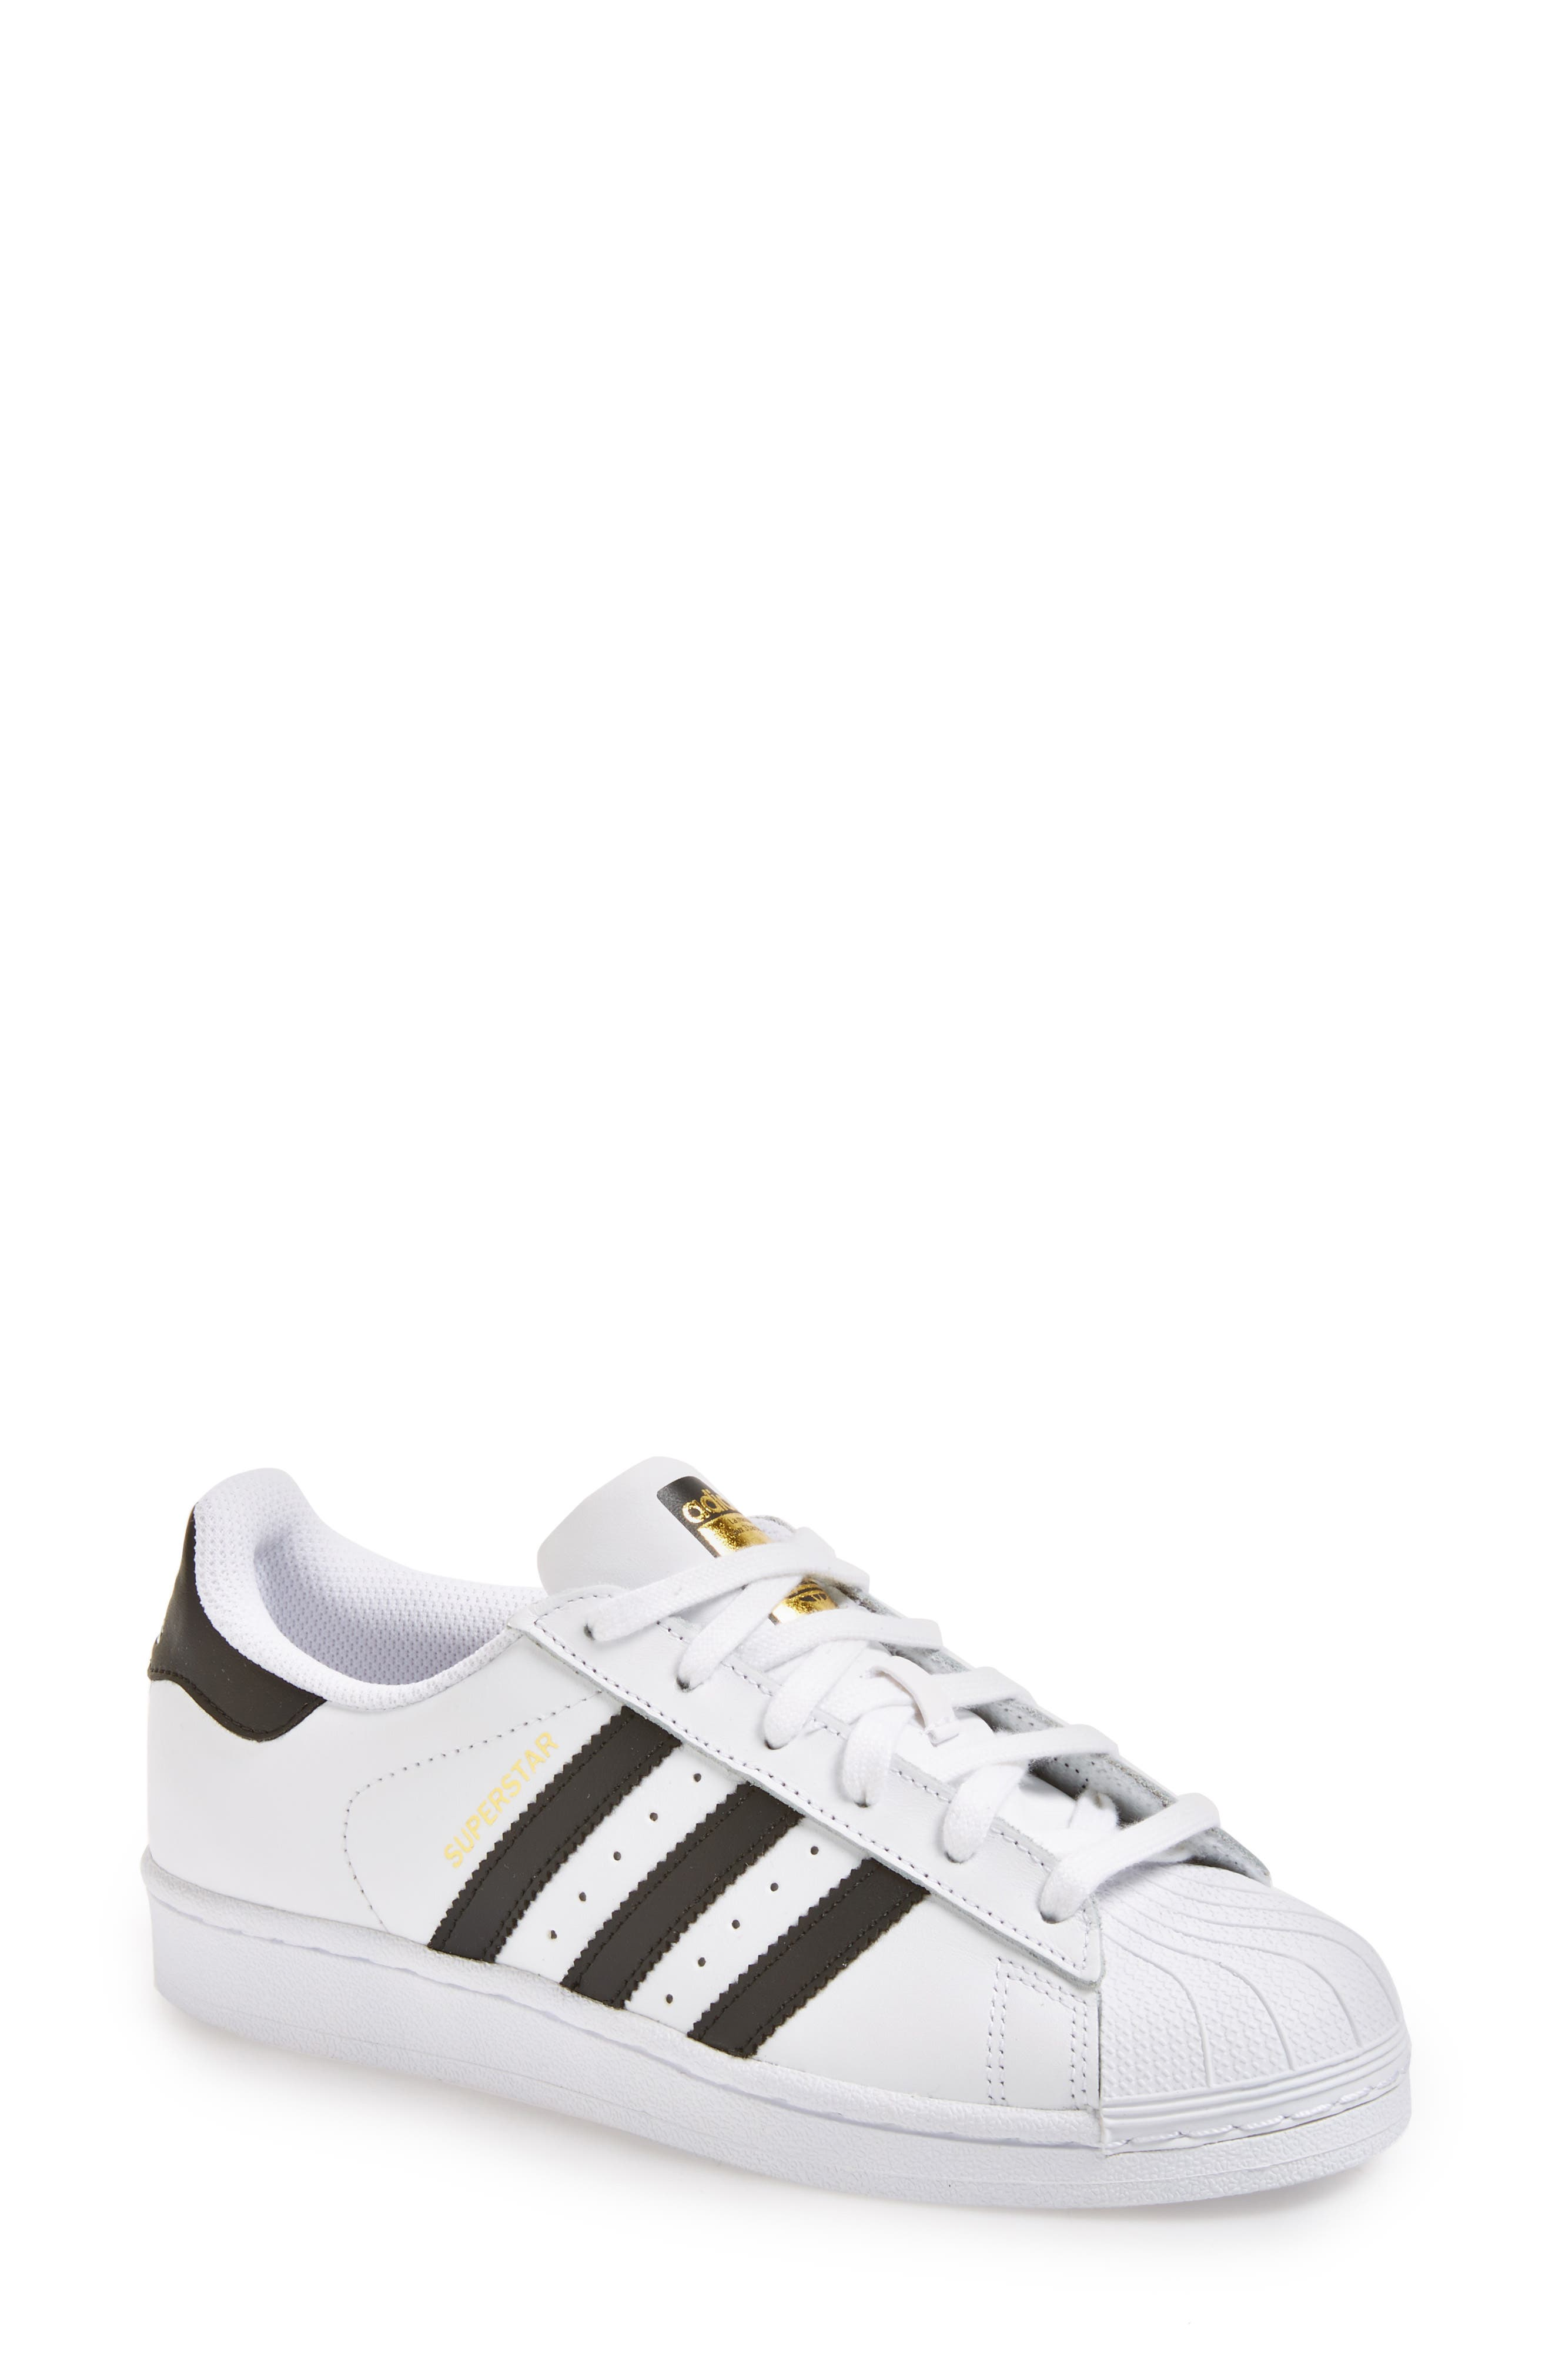 promo code 90966 a4202 ... germany superstar sneaker main 5e74b 237b0